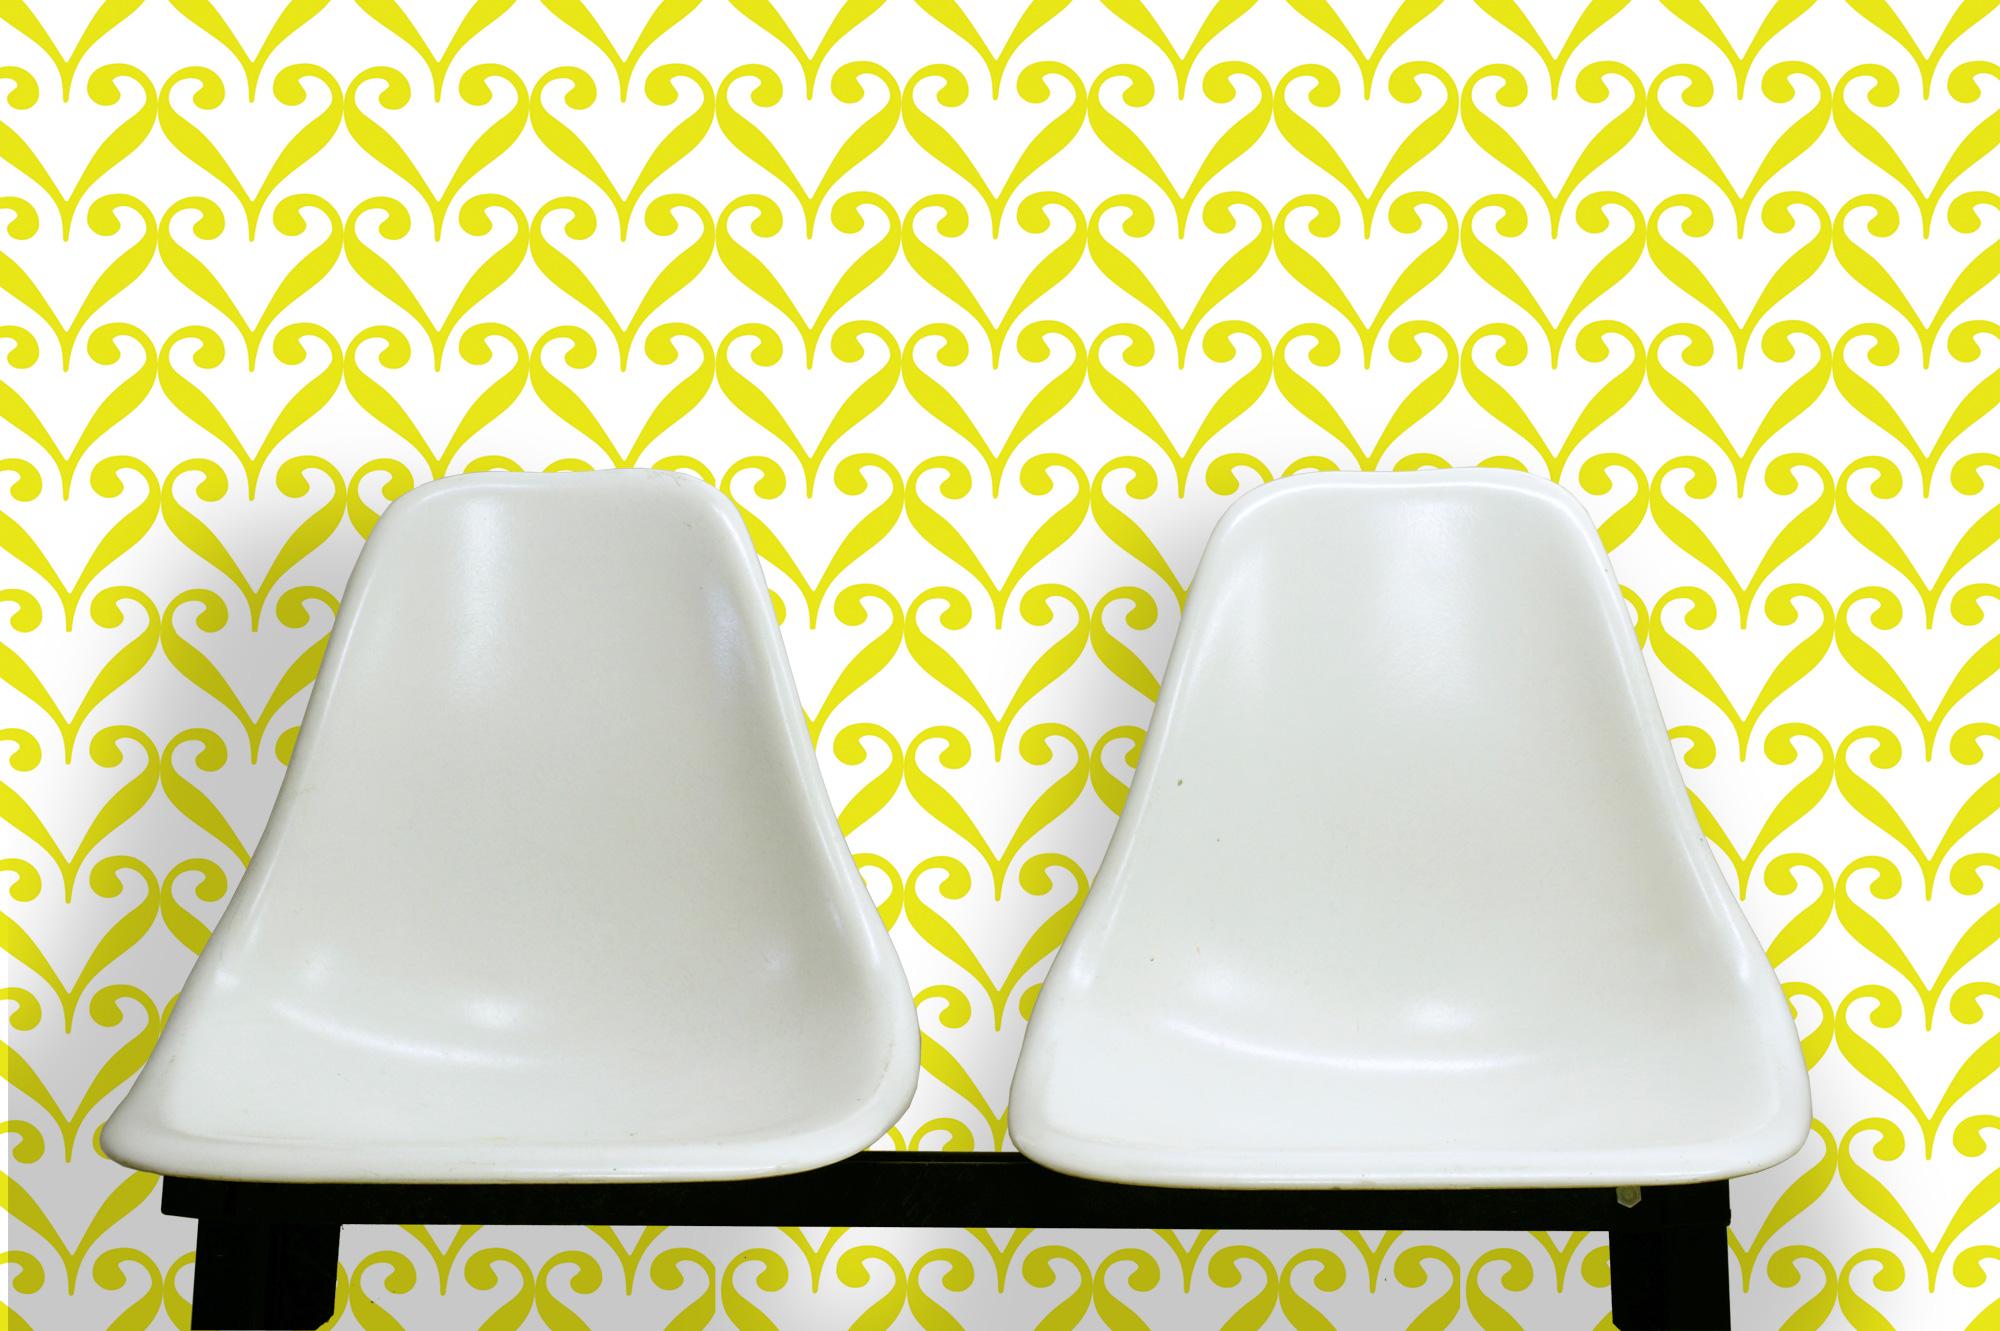 White-Fiberglass-Chairs-SARAH-saffron.jpg